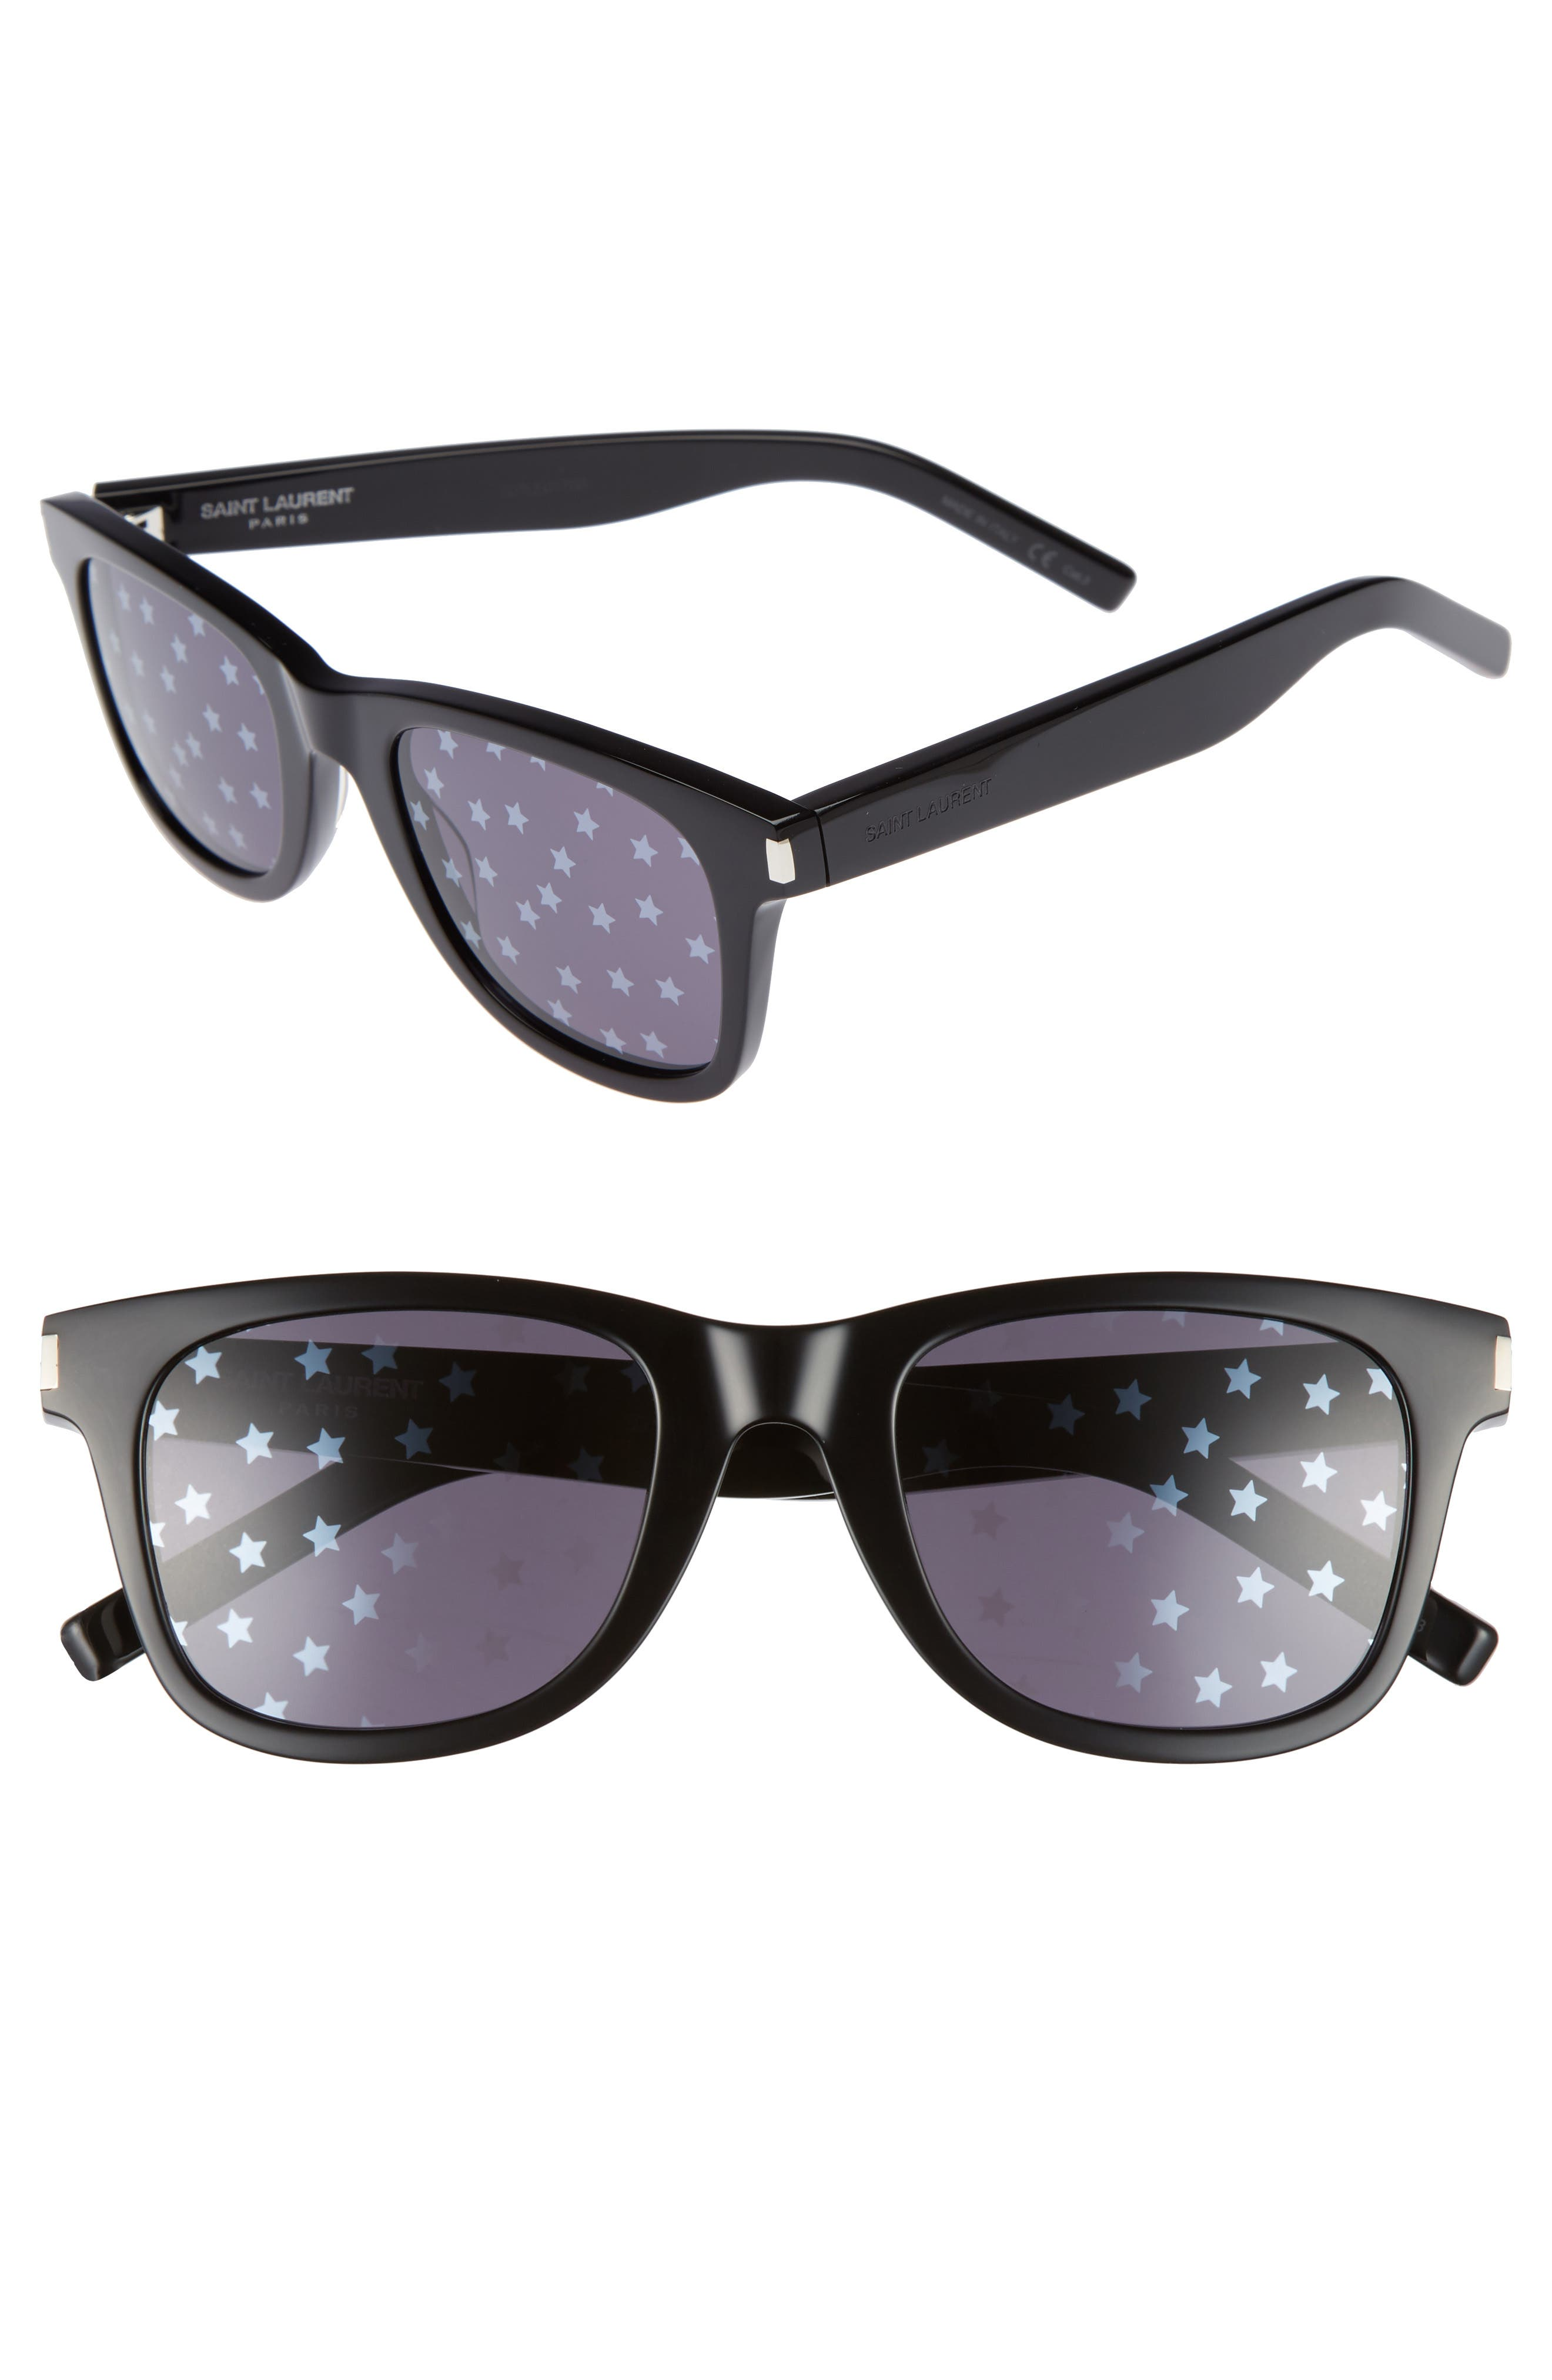 Main Image - Saint Laurent SL51 50mm Sunglasses